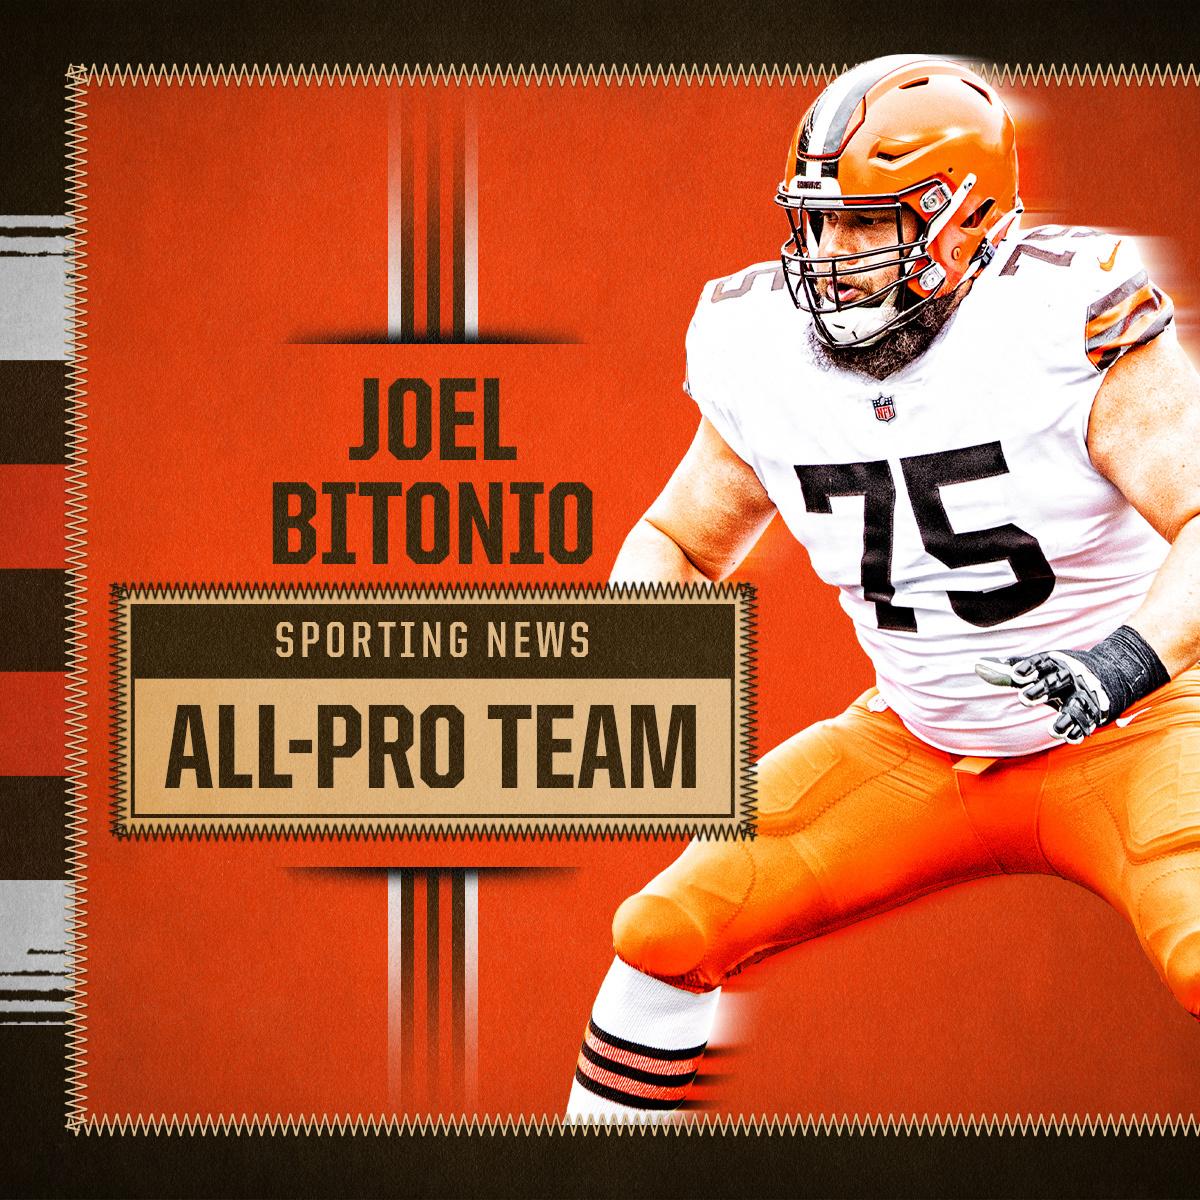 More All-Pro honors for Joel Bitonio and Myles Garrett  📰 »